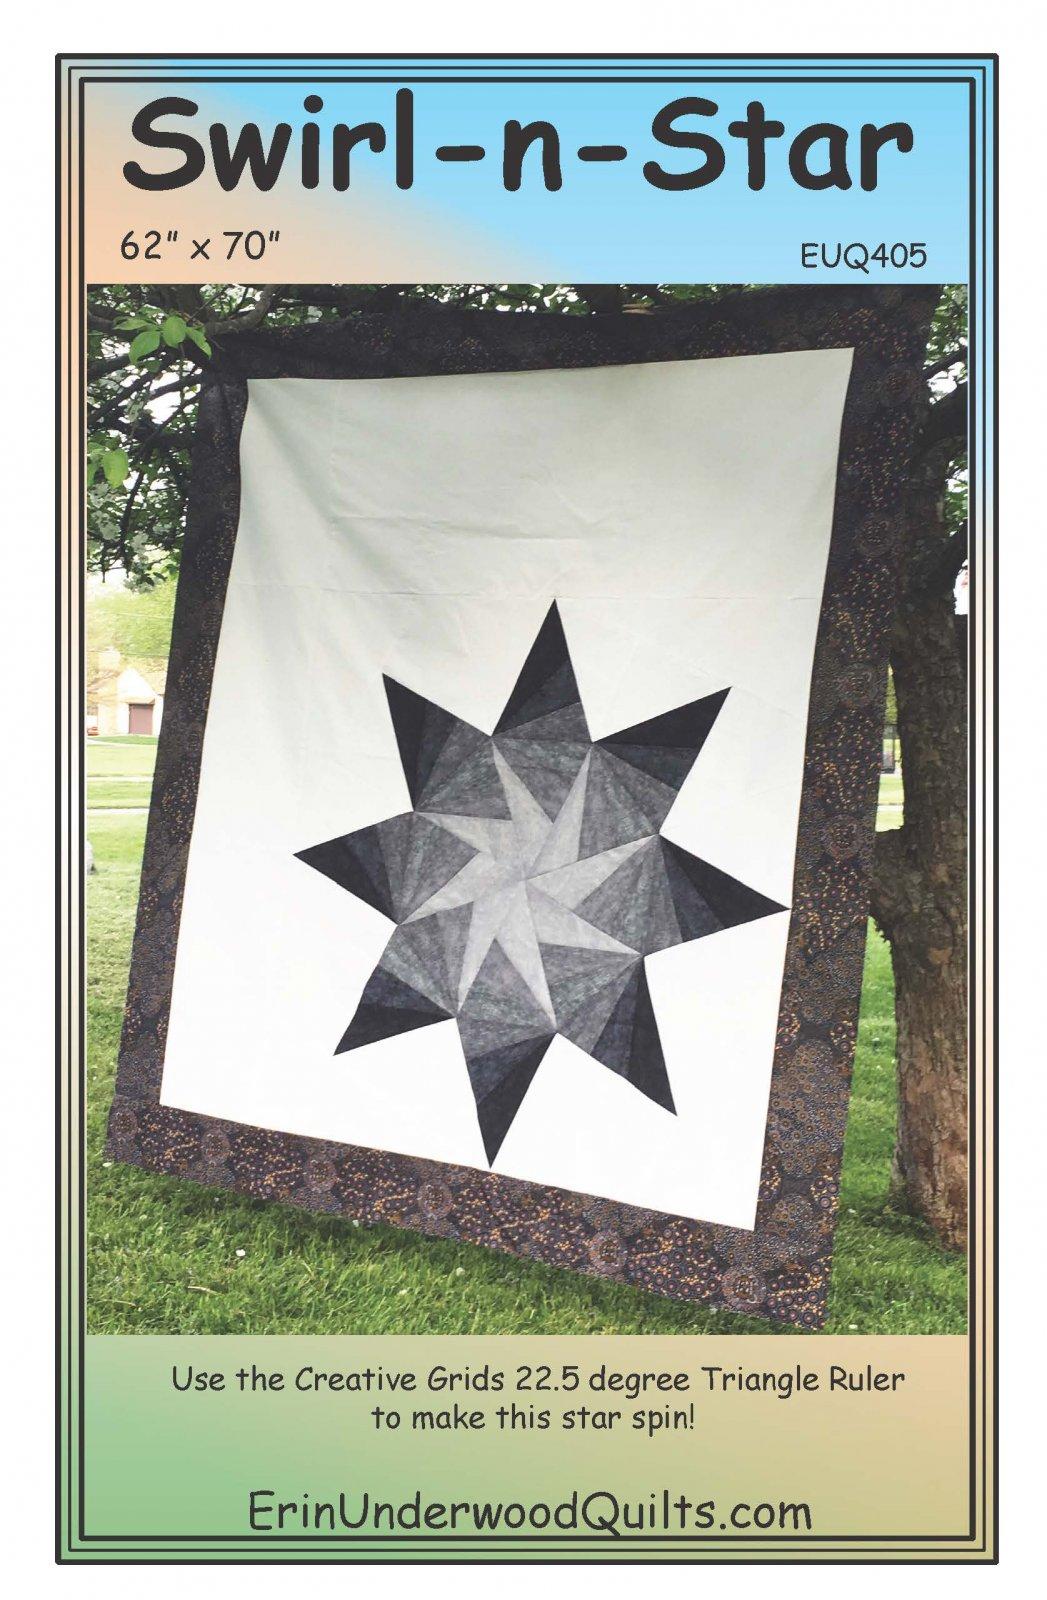 Swirl-n-Star